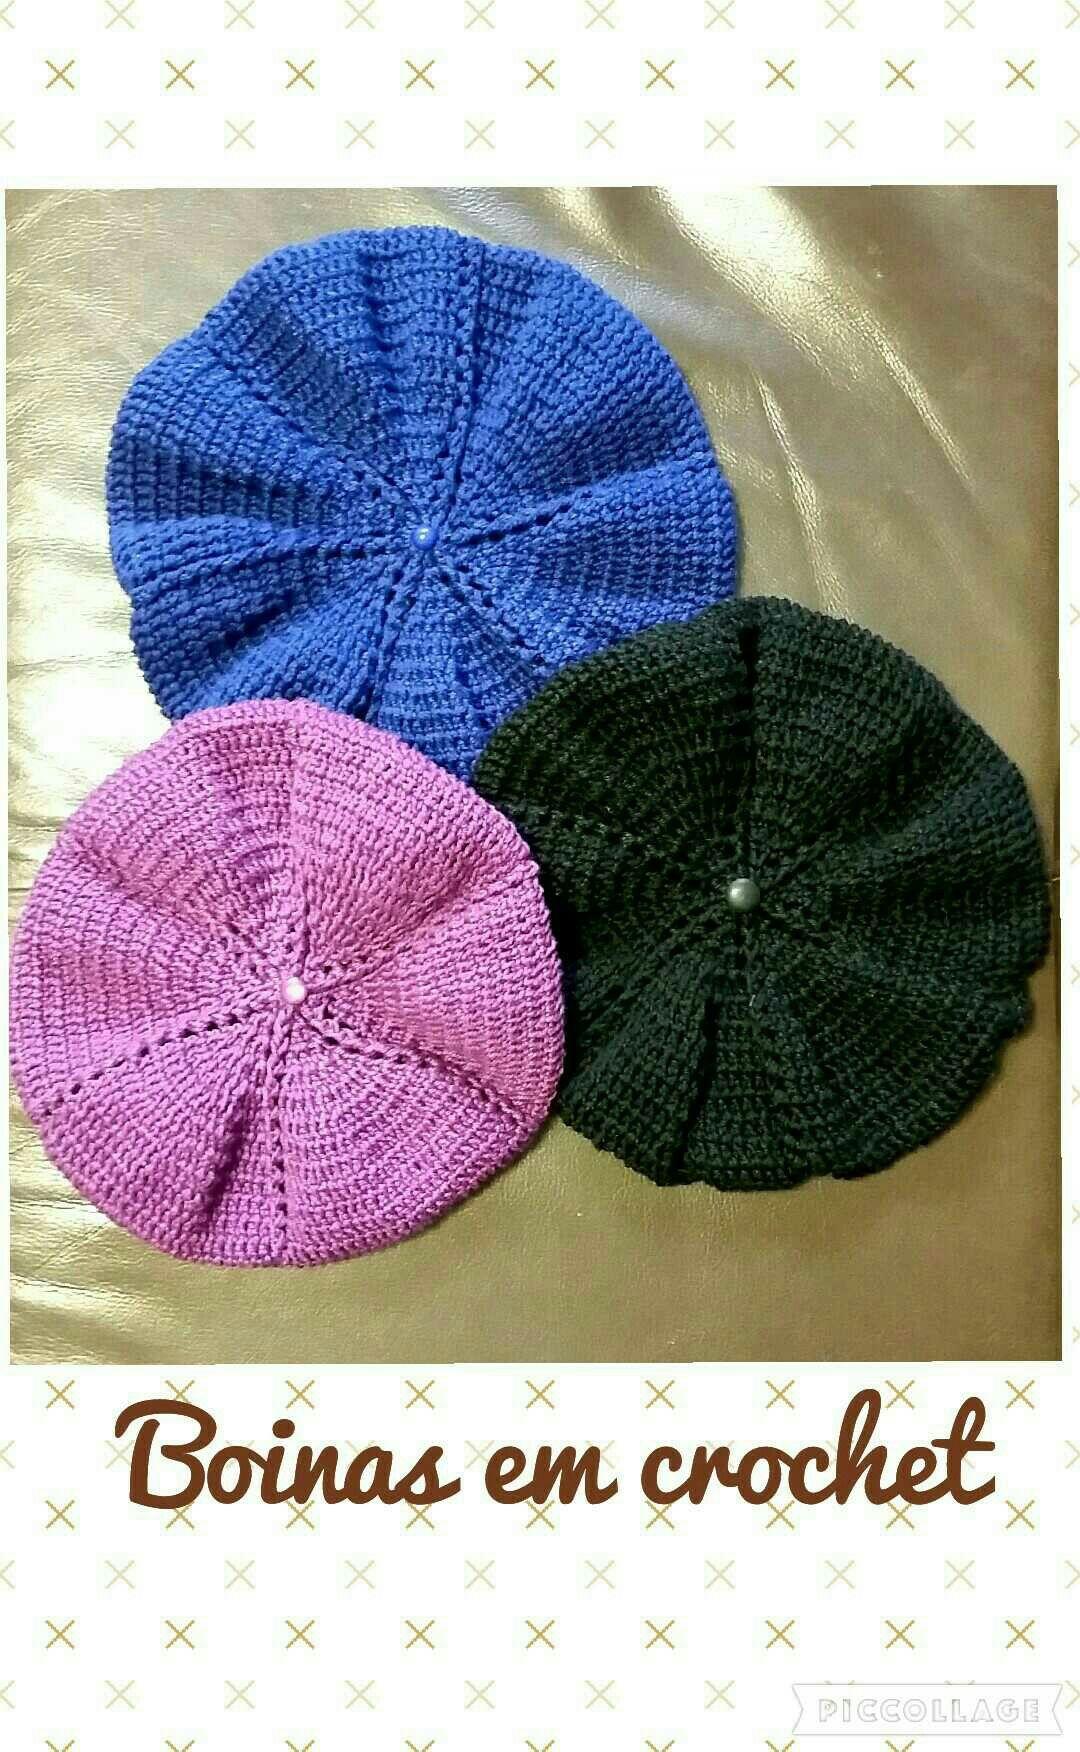 Boinas adulto em crochet